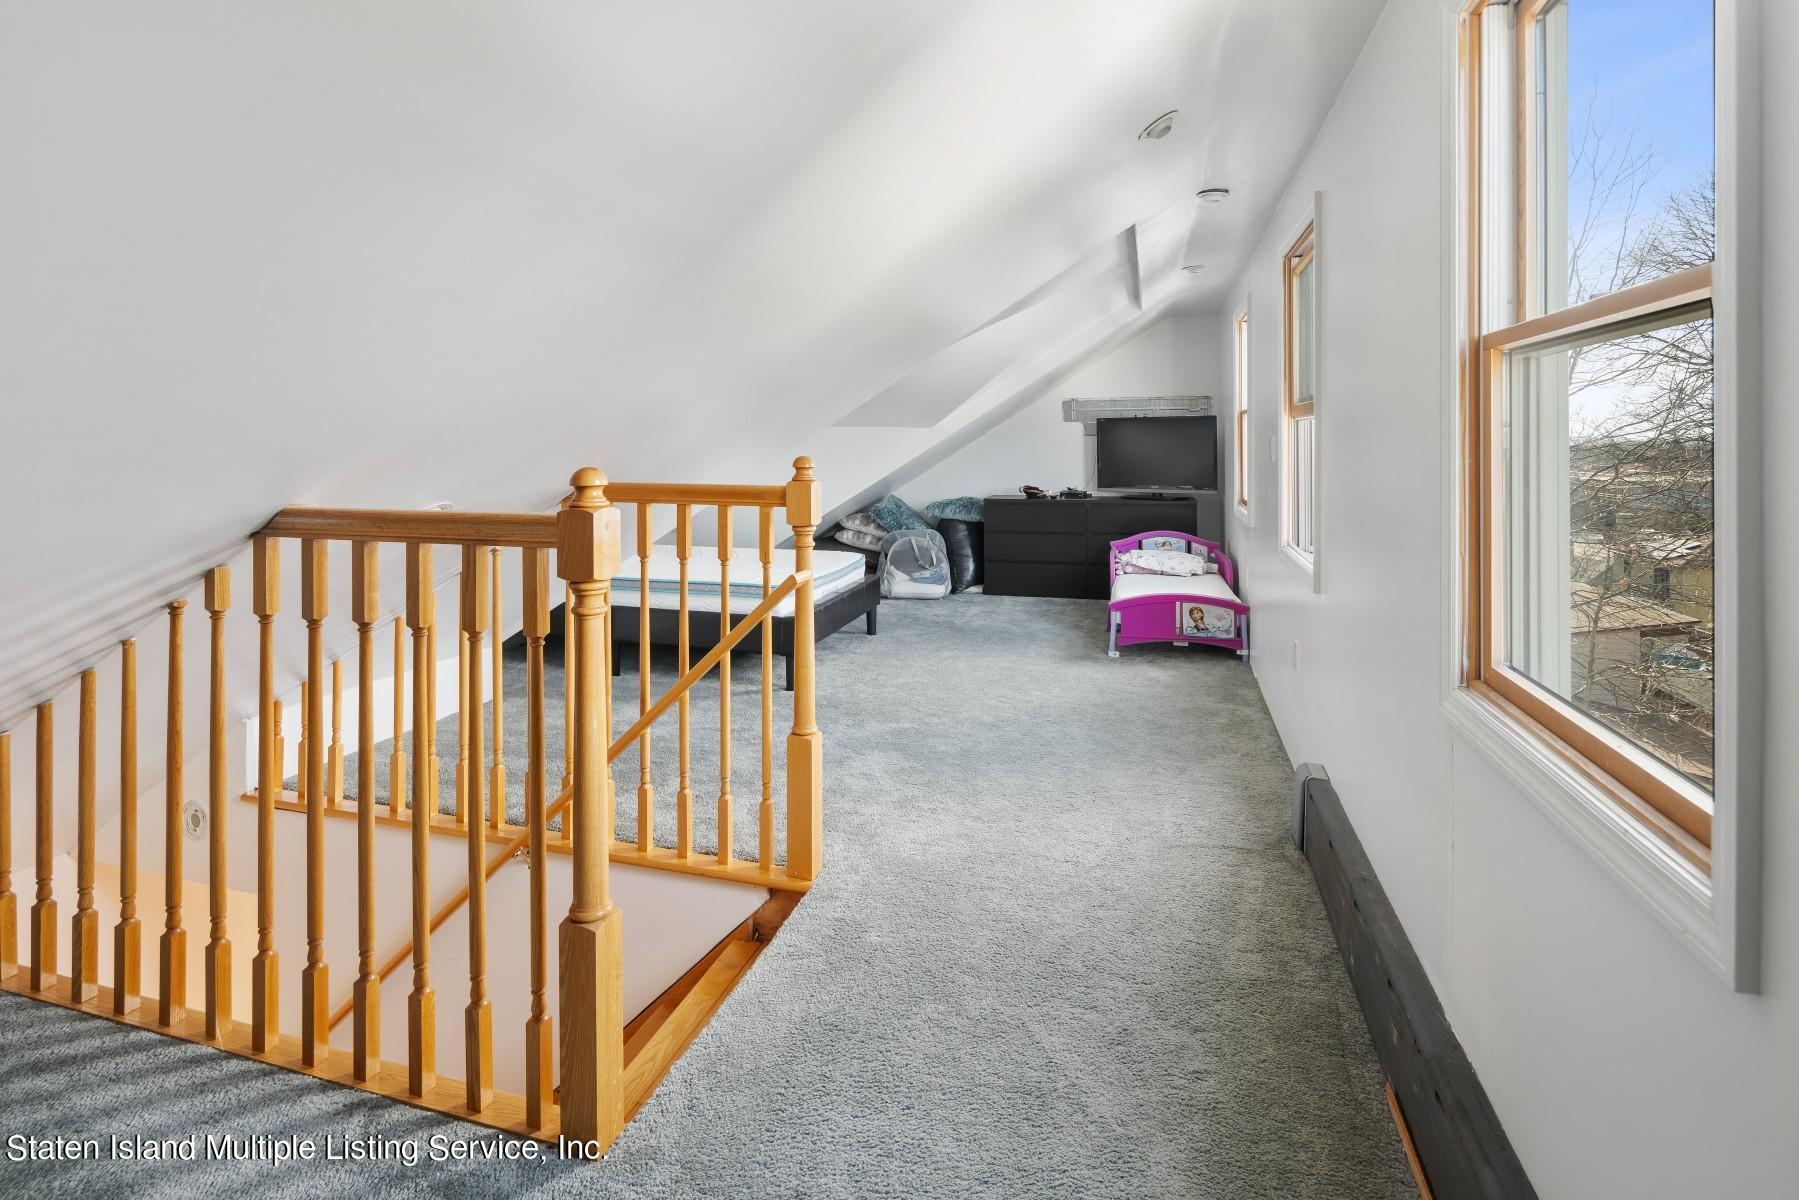 Single Family - Detached 8 Bionia Avenue  Staten Island, NY 10305, MLS-1142818-15